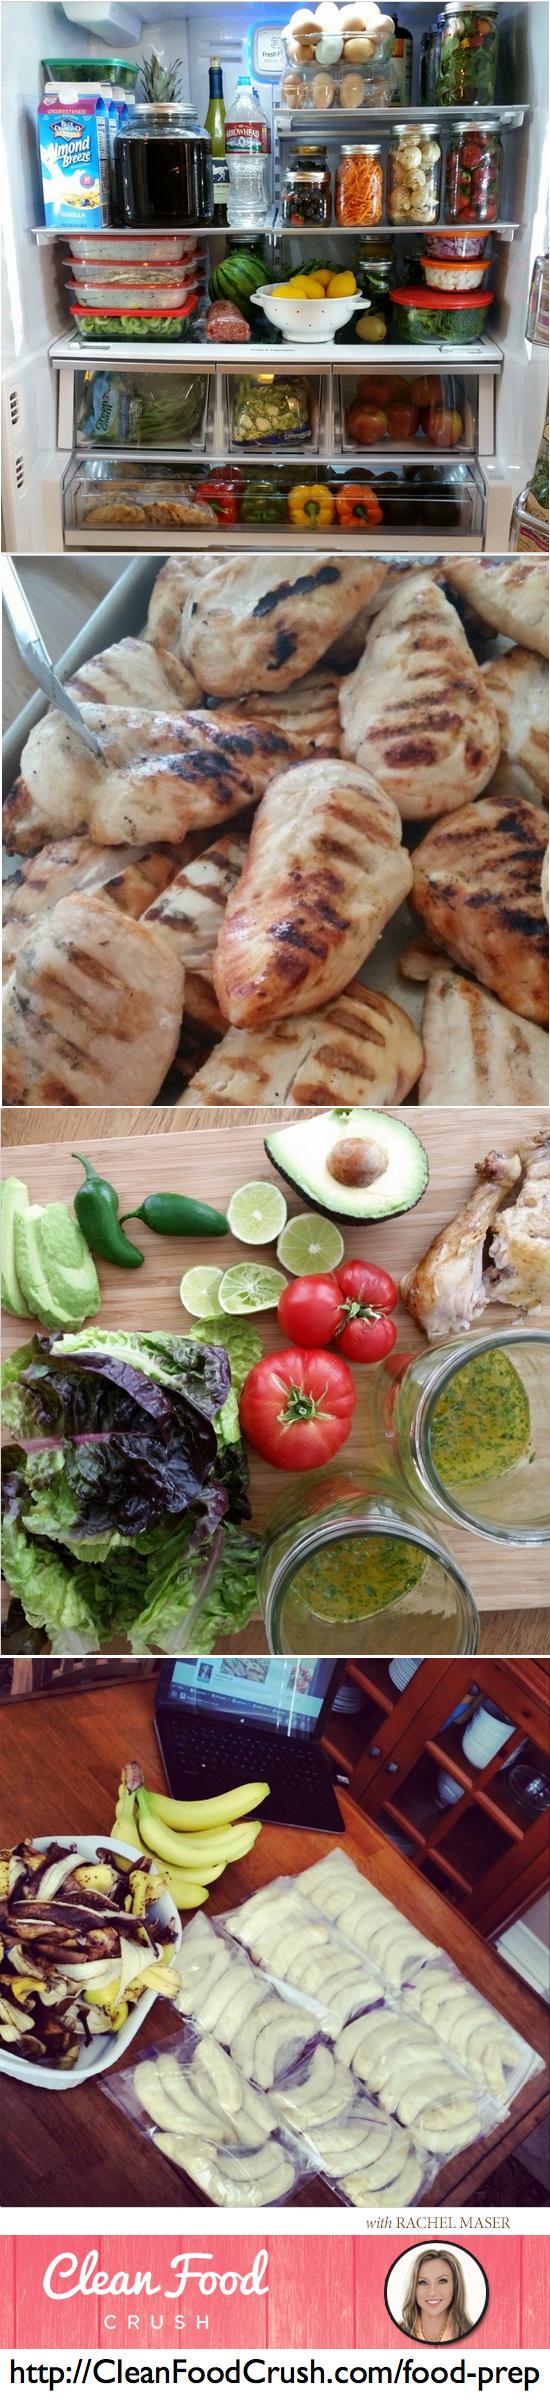 clean food crush food prep instructions http://cleanfoodcrush.com/food-prep/